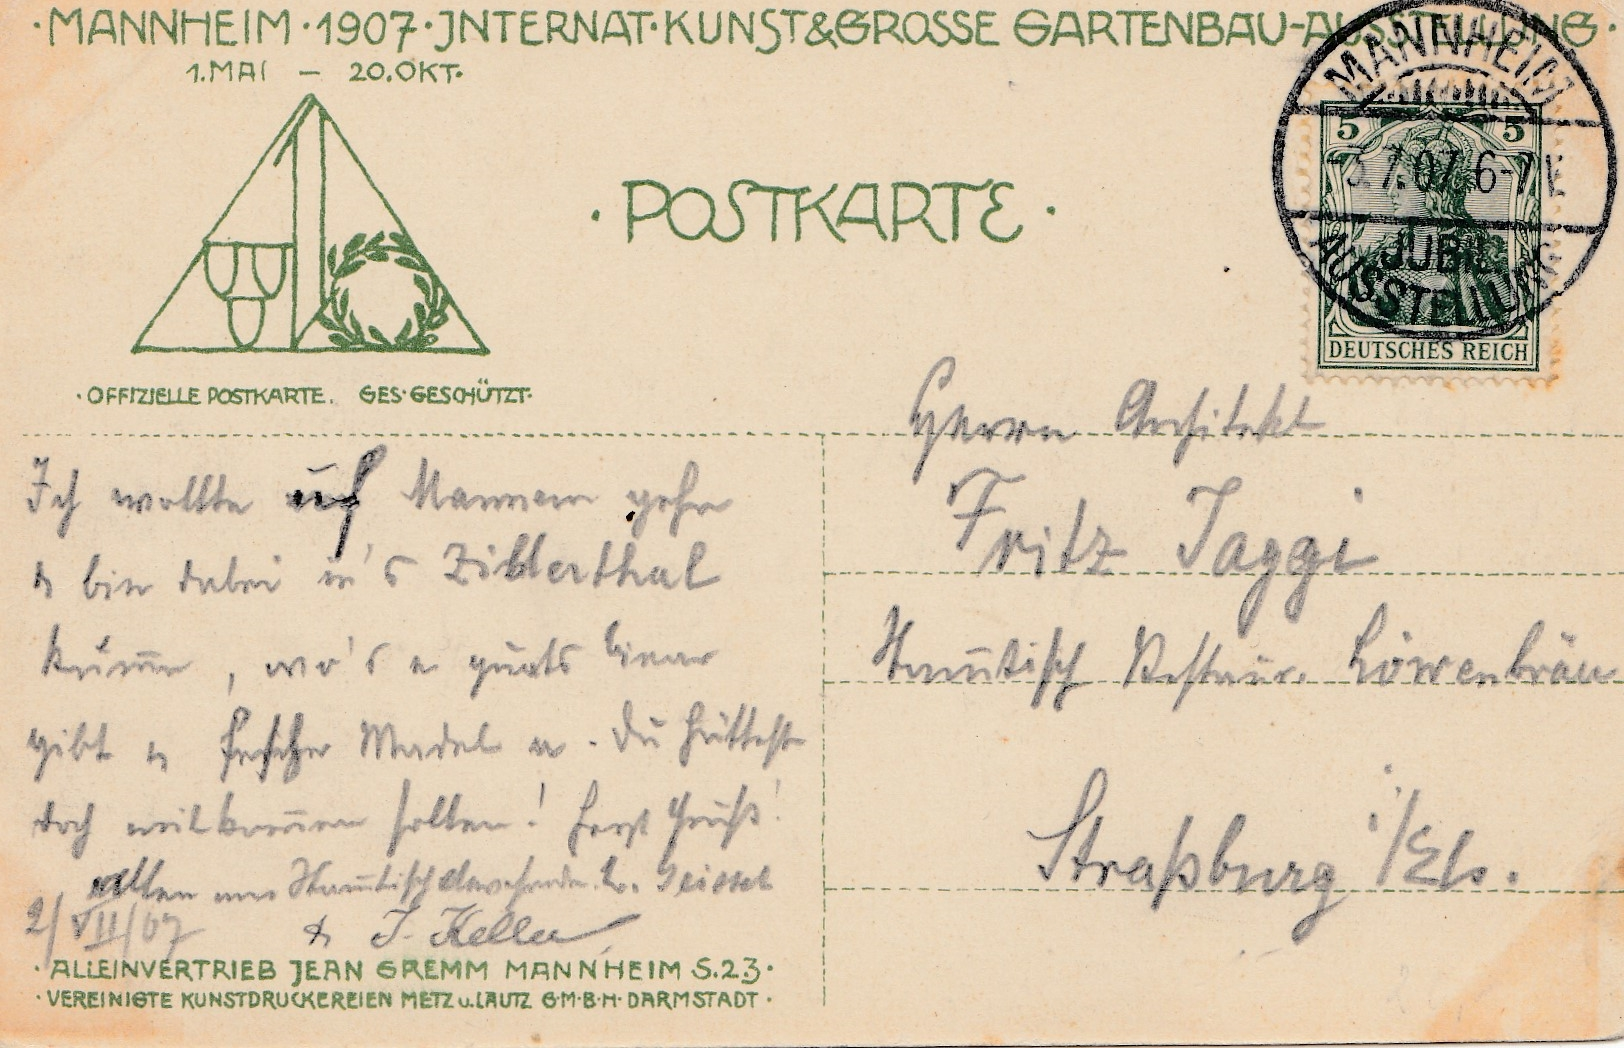 Gartenbau Mannheim ak jubiläums ausstellung mannheim 1907 kunst gartenbau philarena